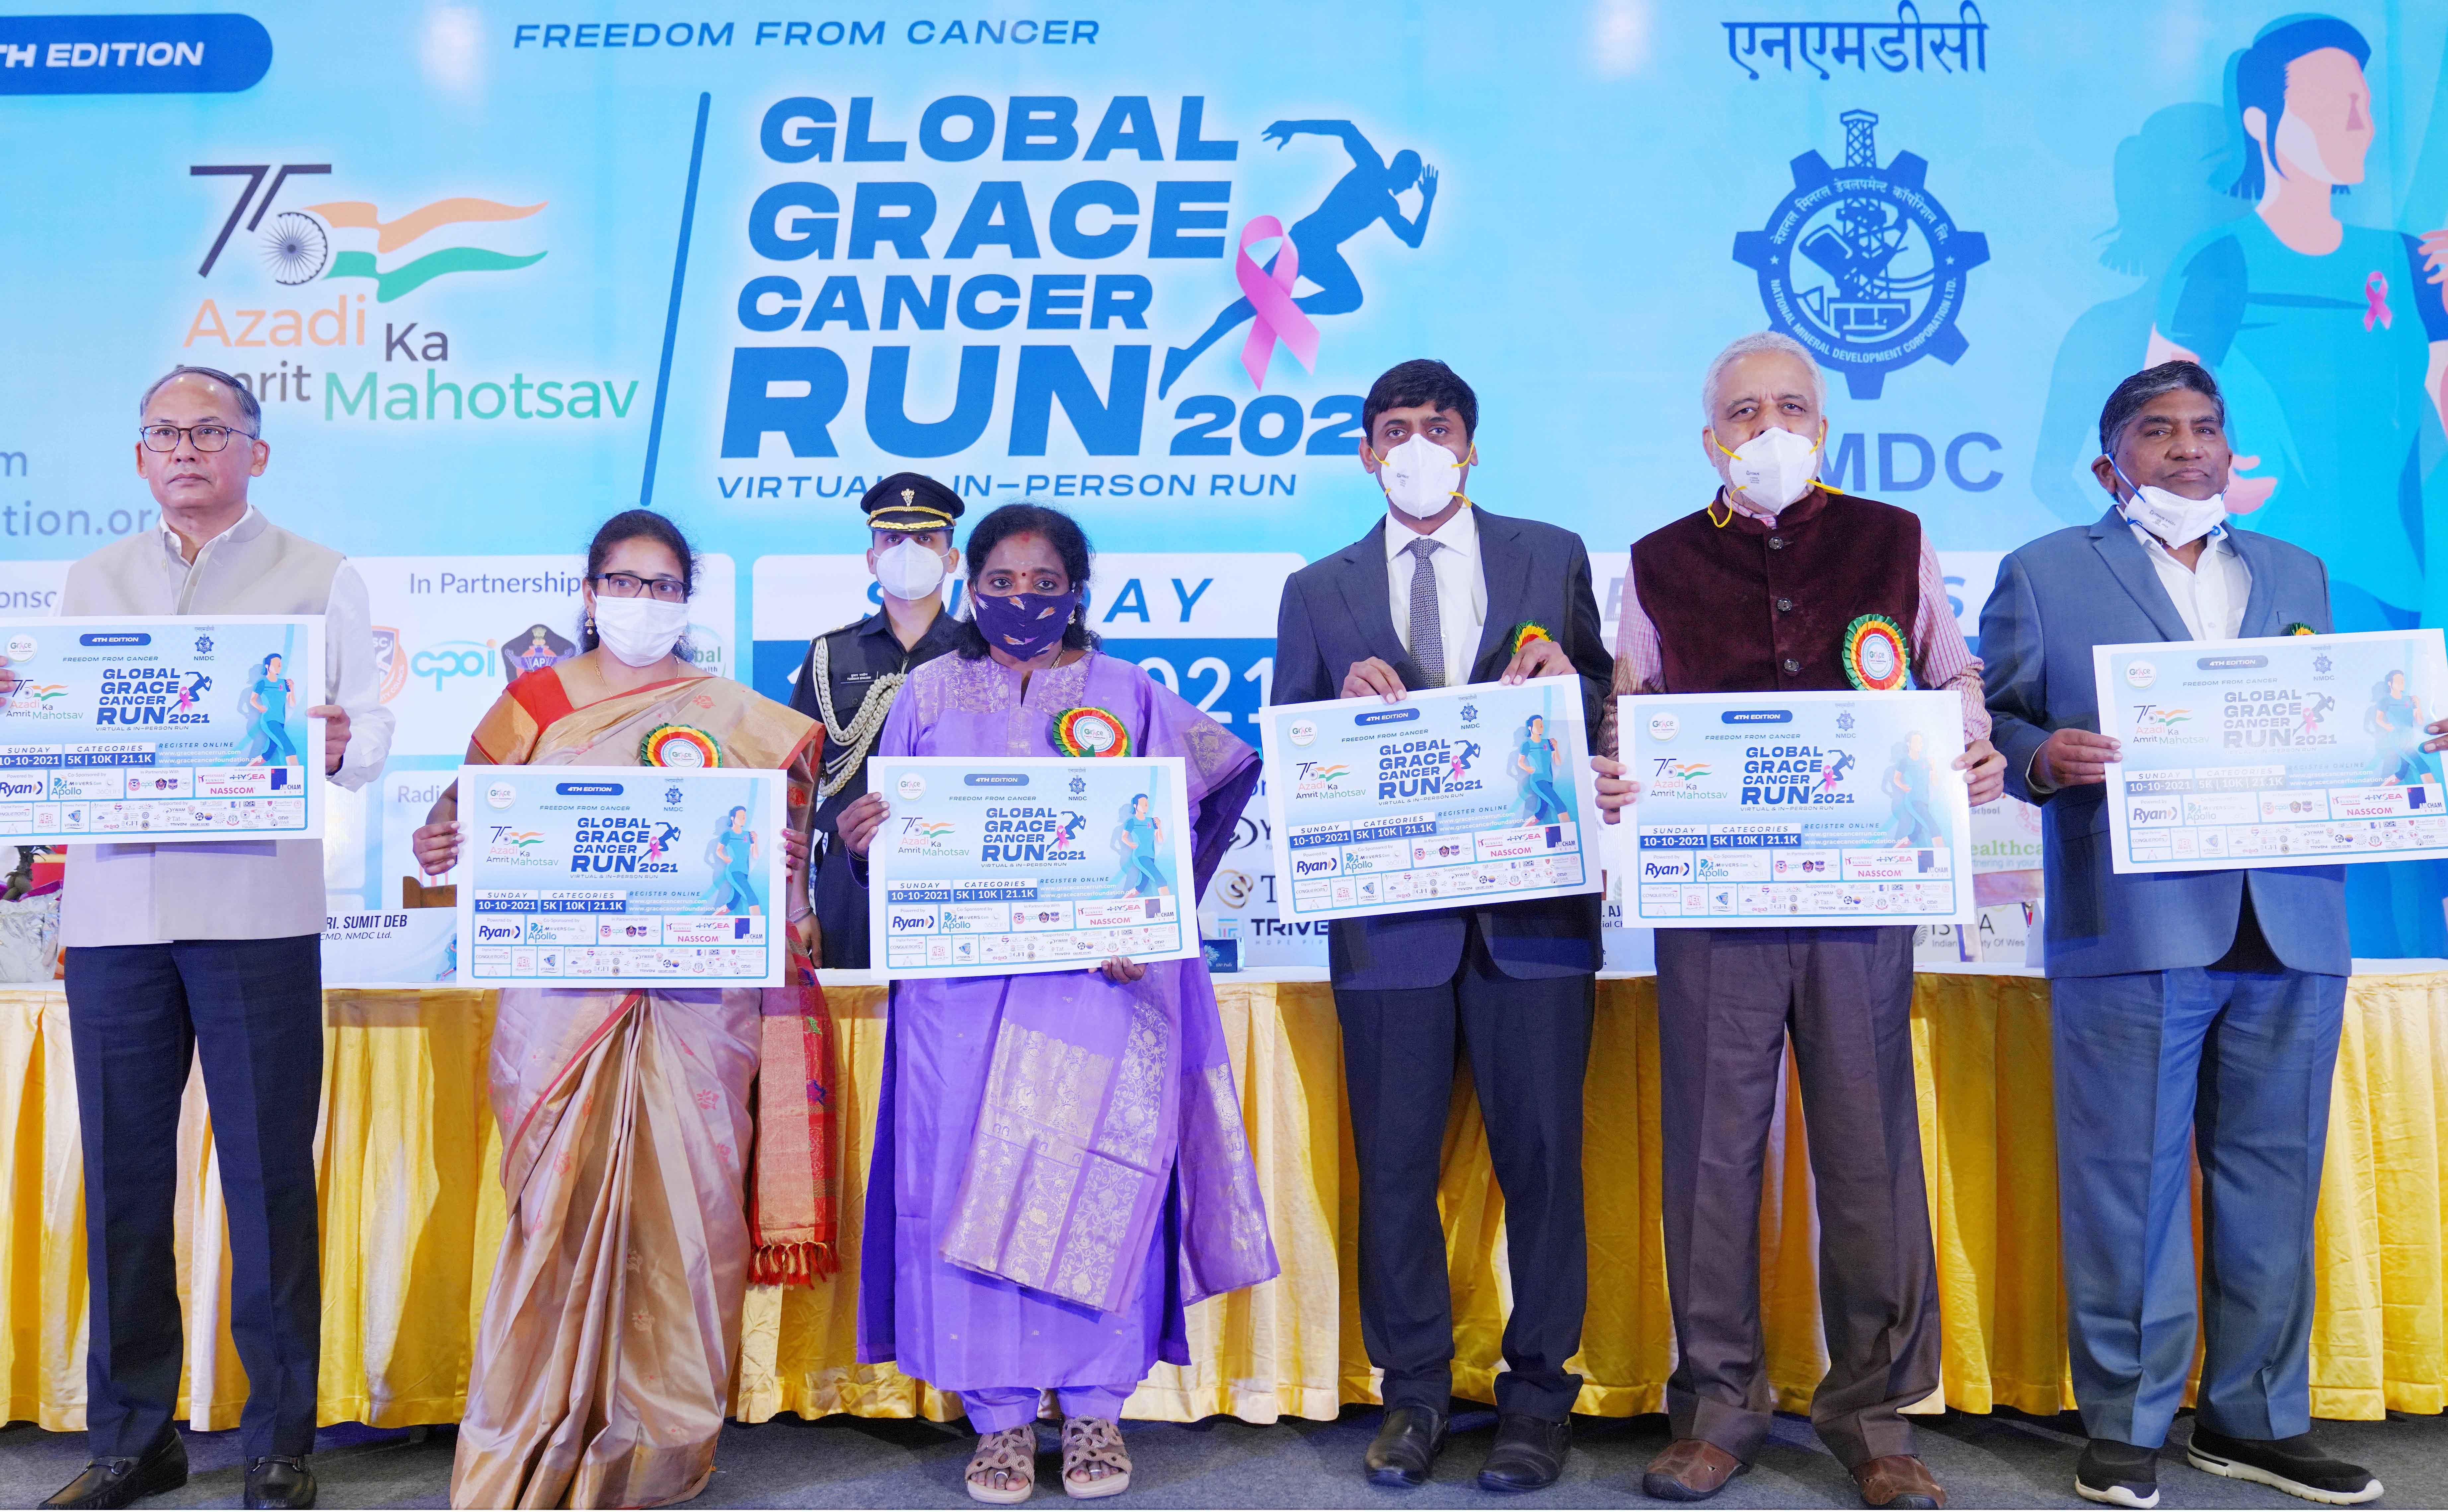 Hon'ble Governor Dr Tamilisai Soundararajan launches the Global run against cancer